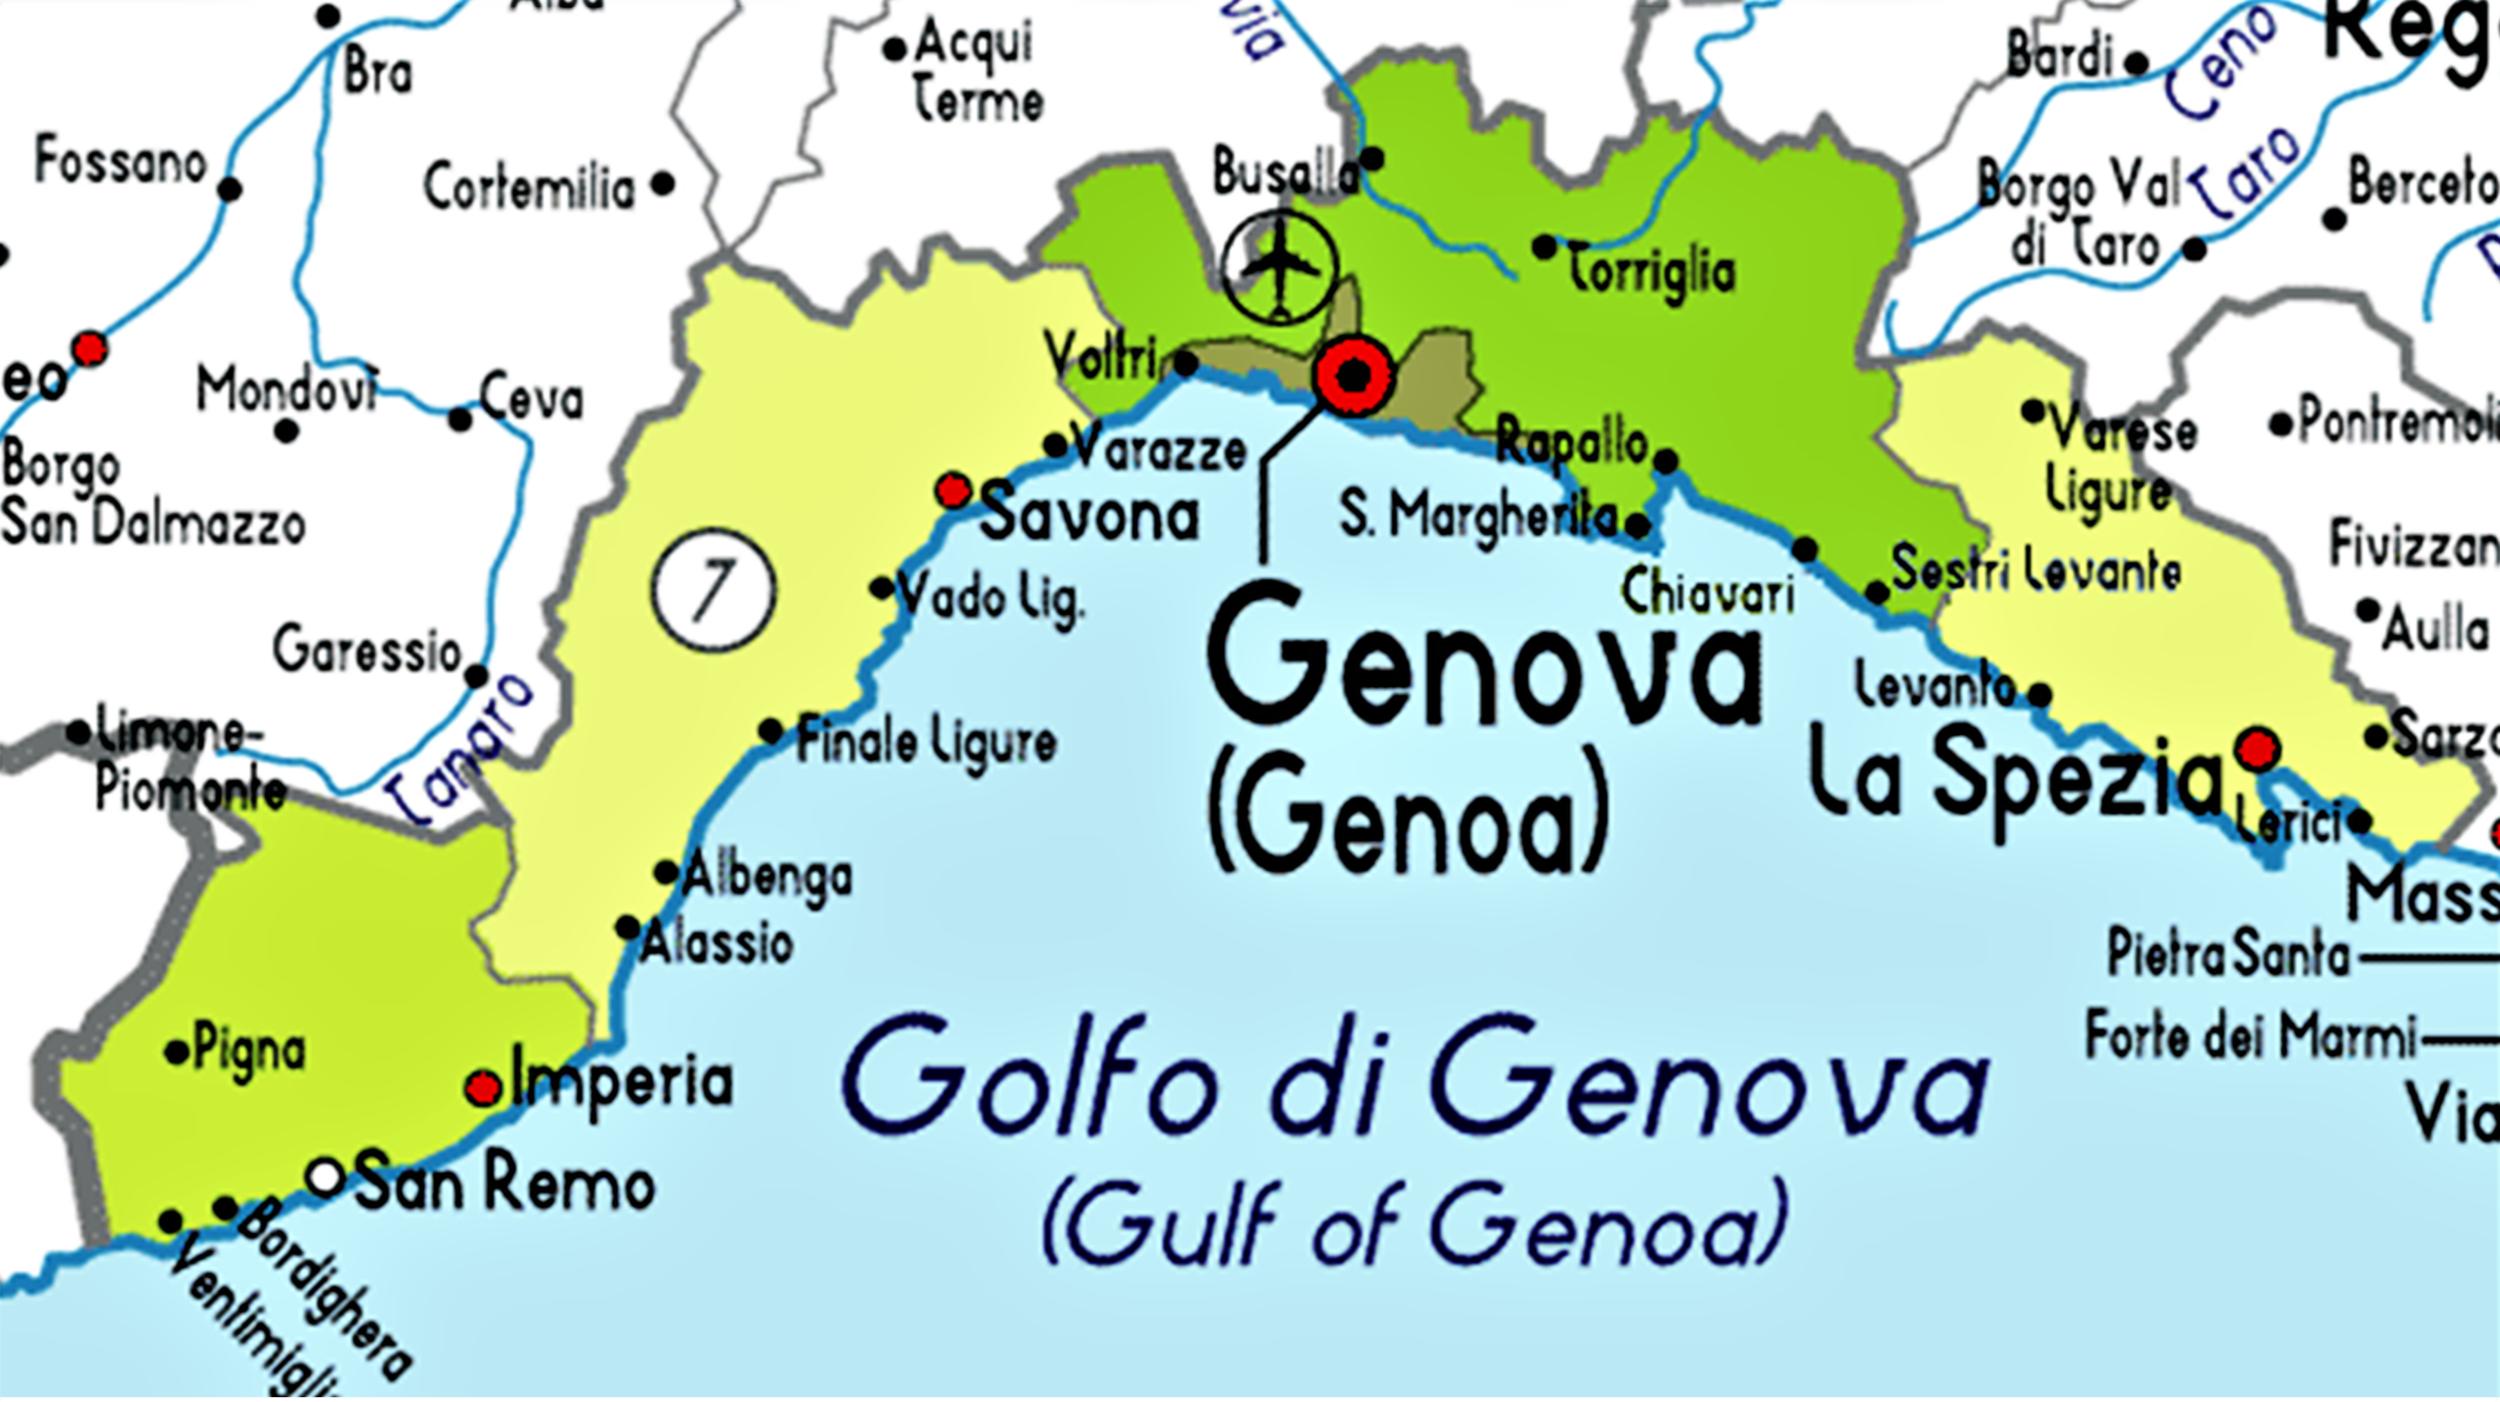 Genoa map